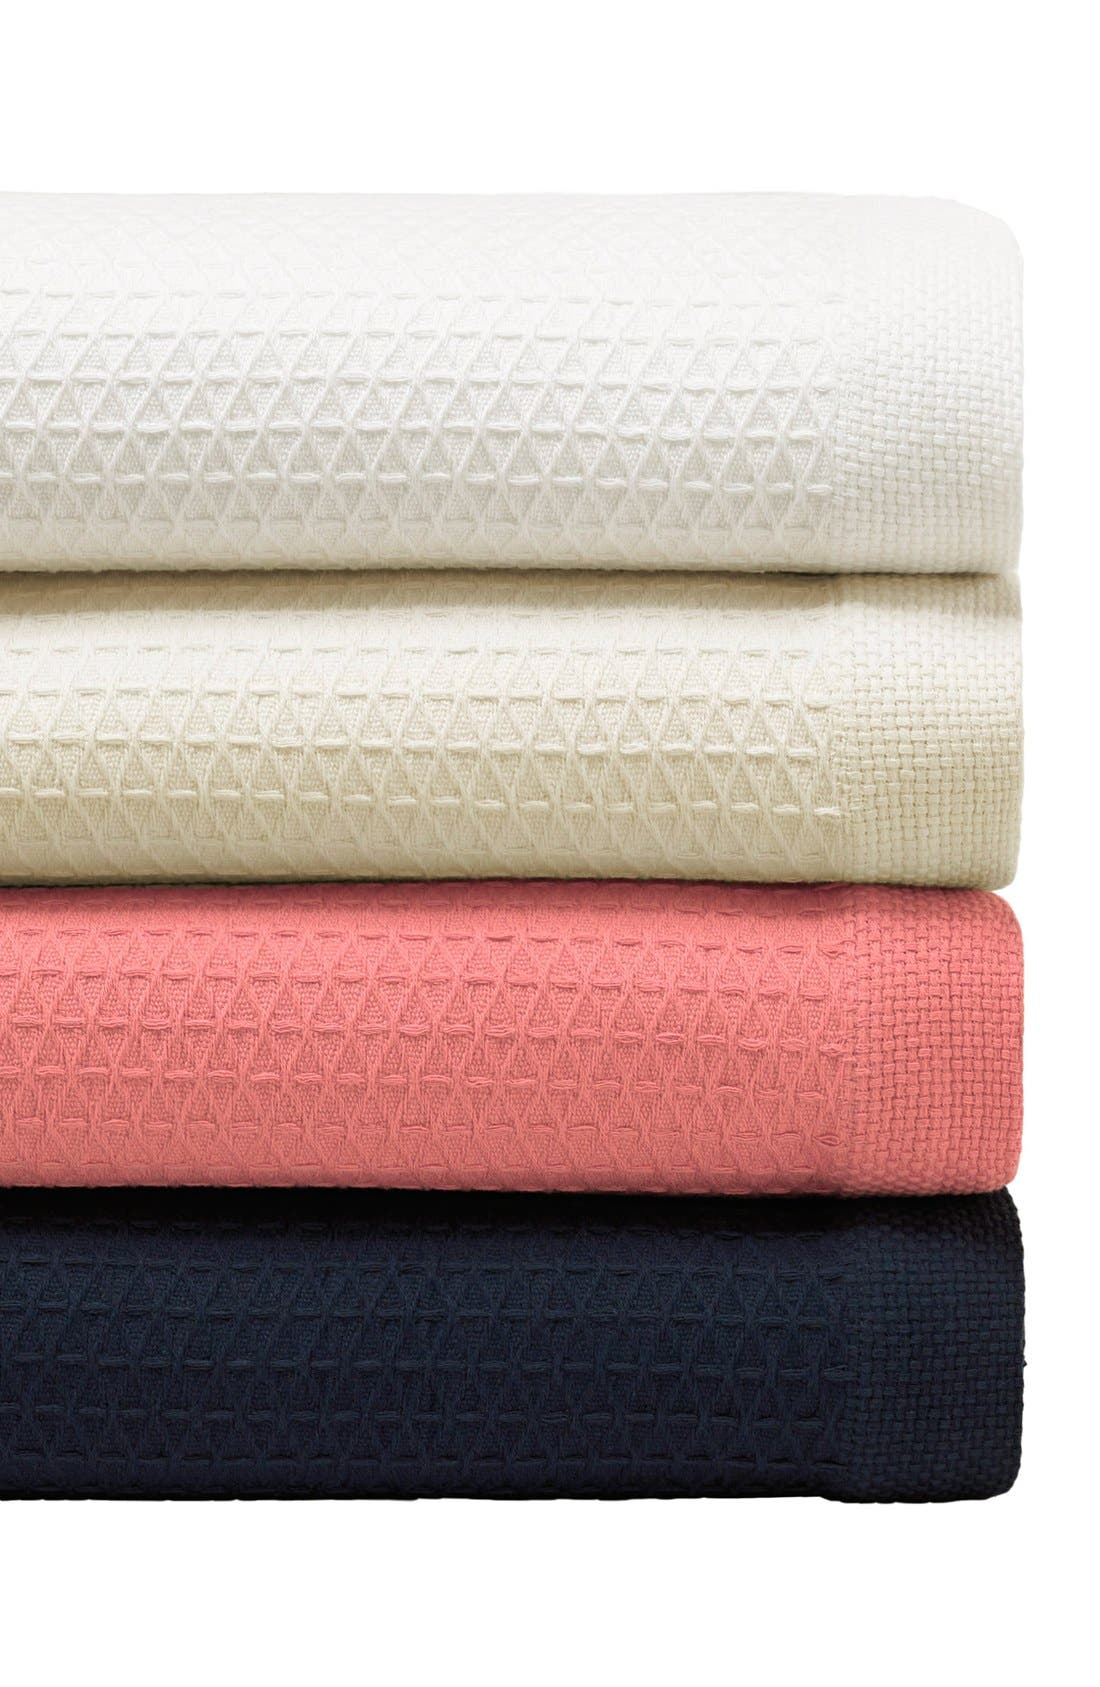 'Baird' Cotton Blanket,                             Alternate thumbnail 2, color,                             WHITE